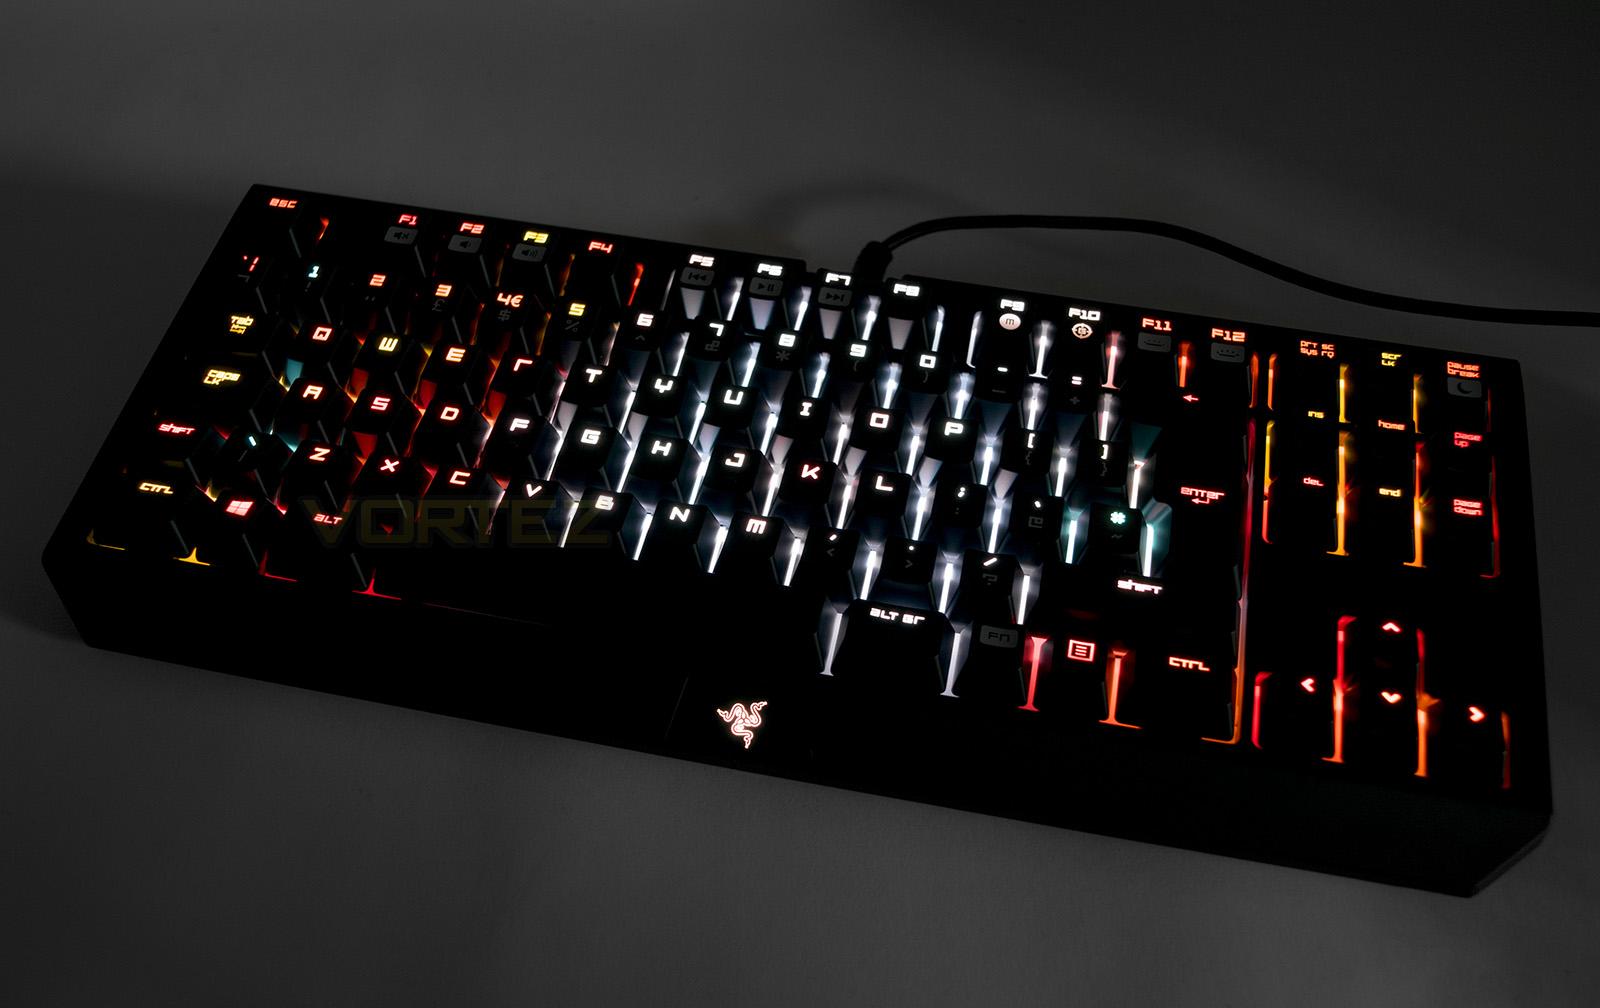 Razer Keyboard Lighting Effects